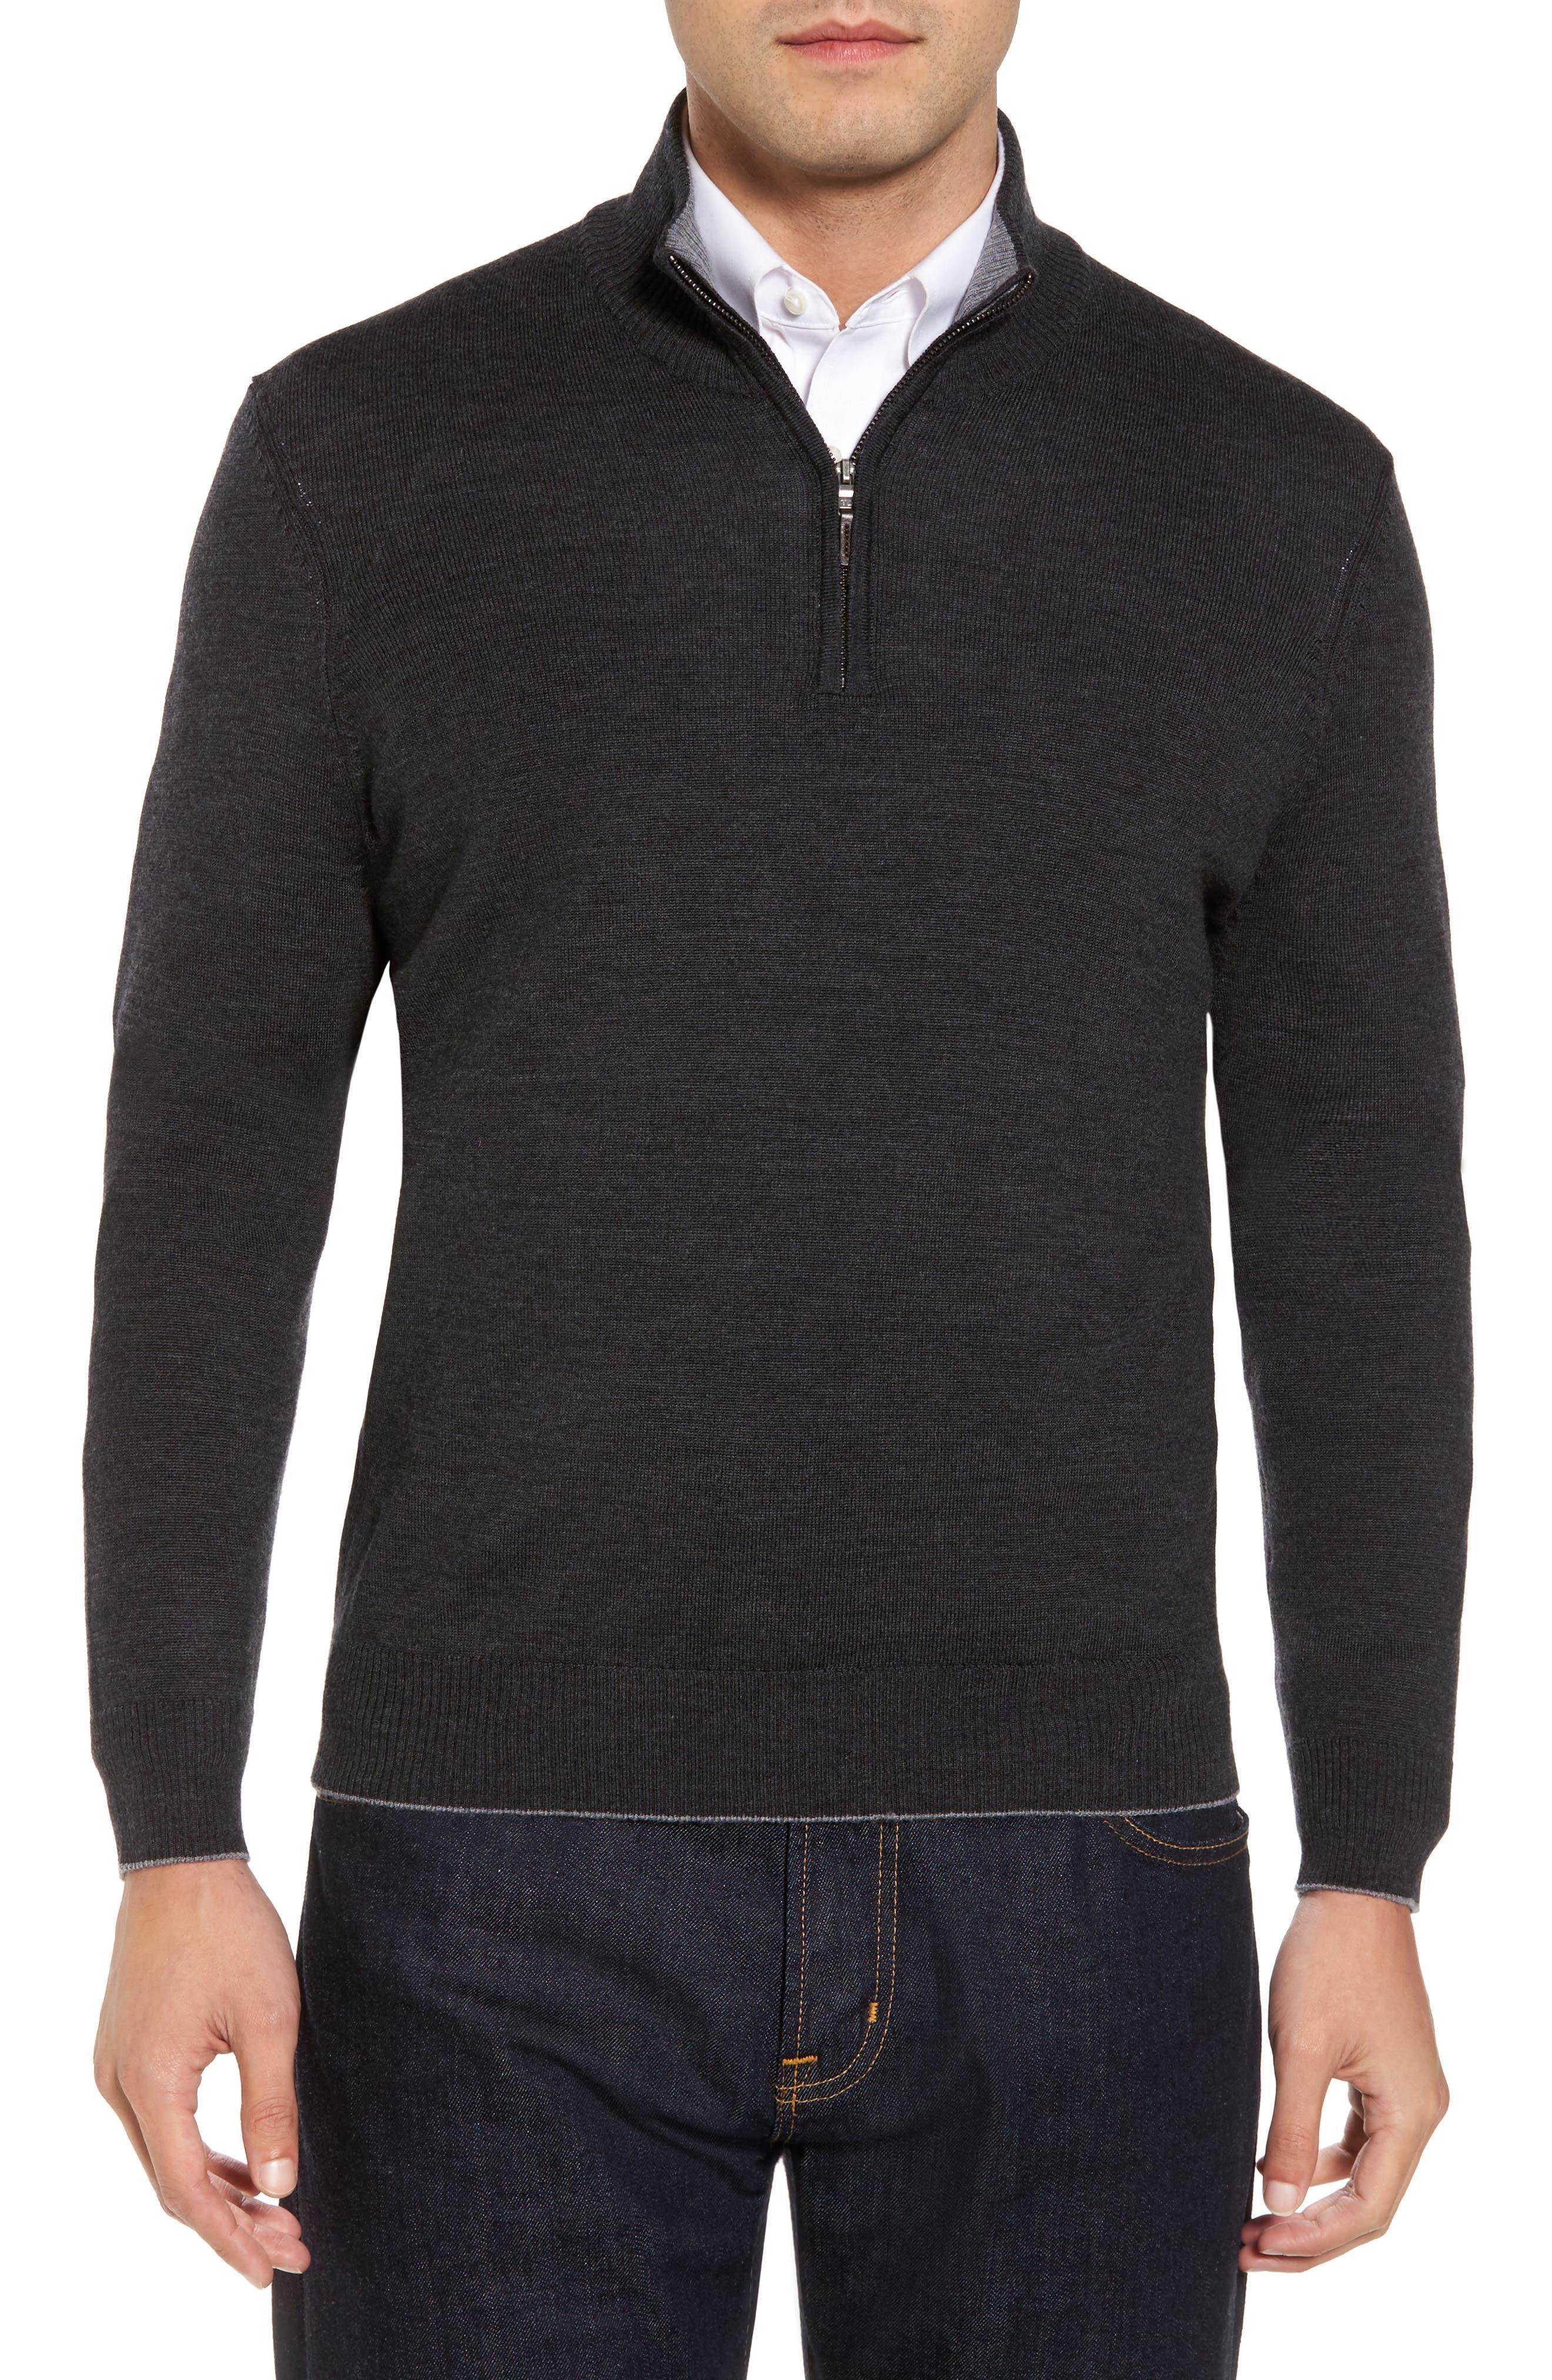 THOMAS DEAN Merino Wool Blend Quarter Zip Sweater, Main, color, 020